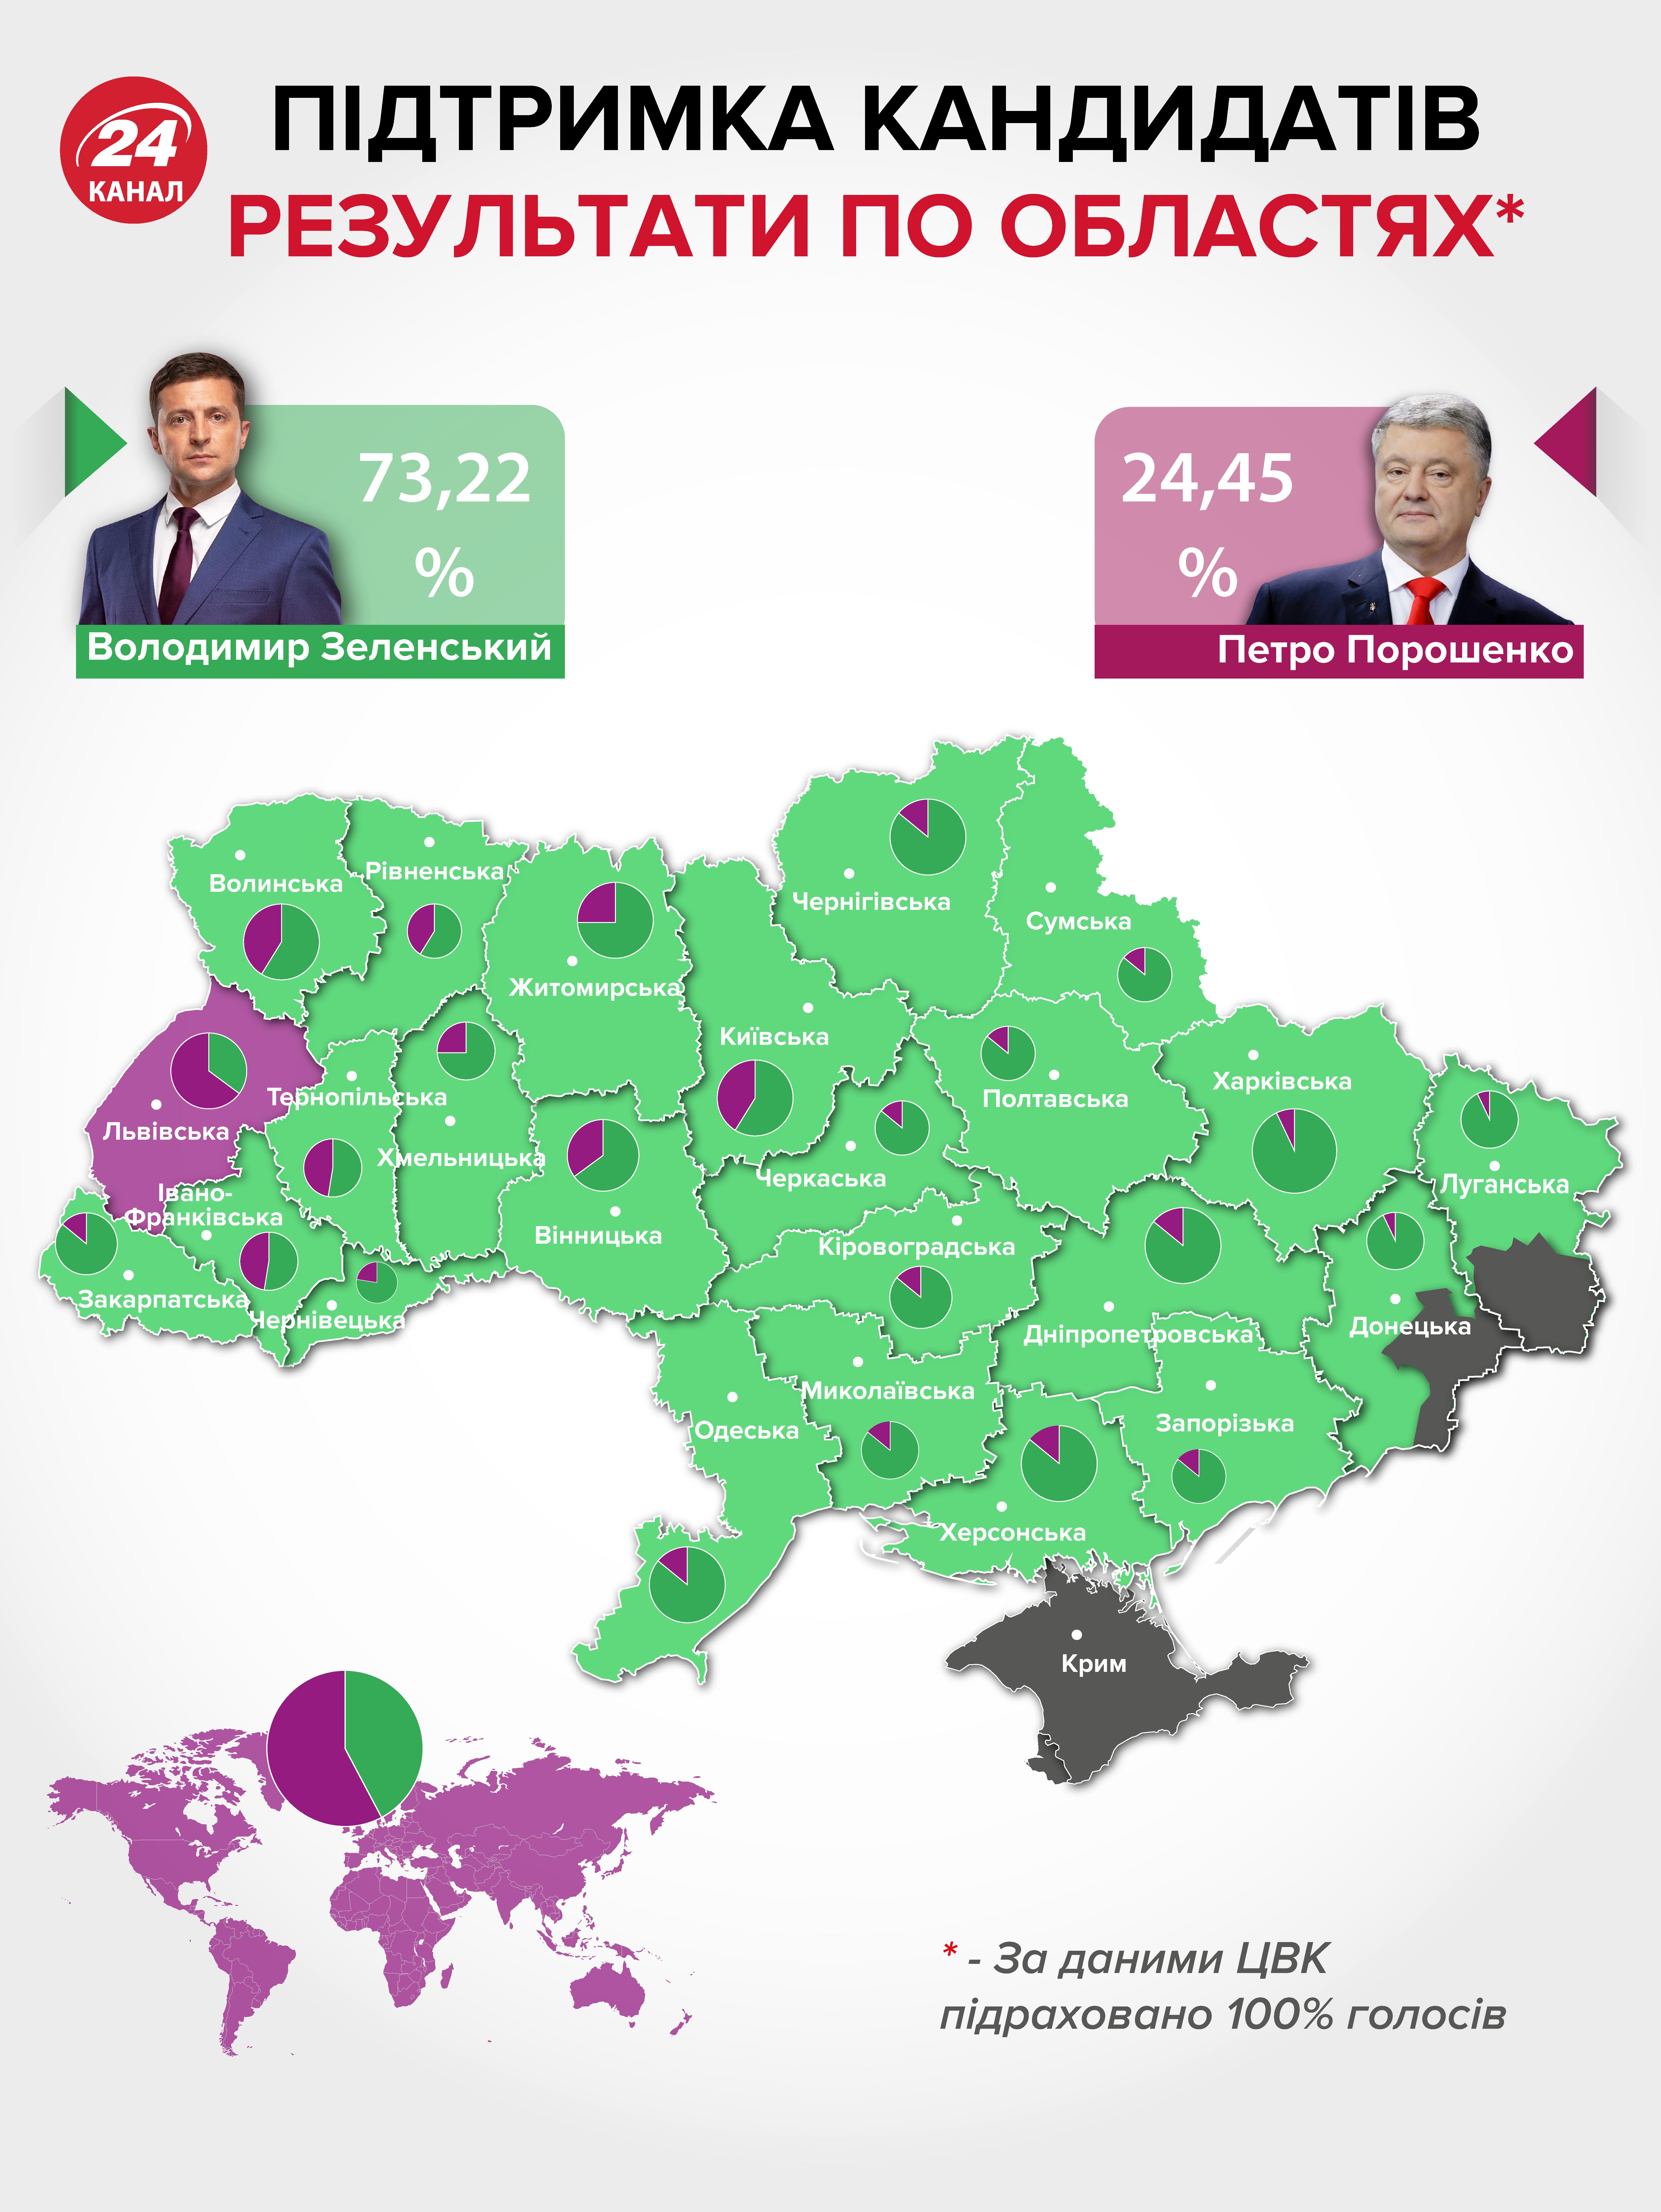 вибори президента зеленський порошенко